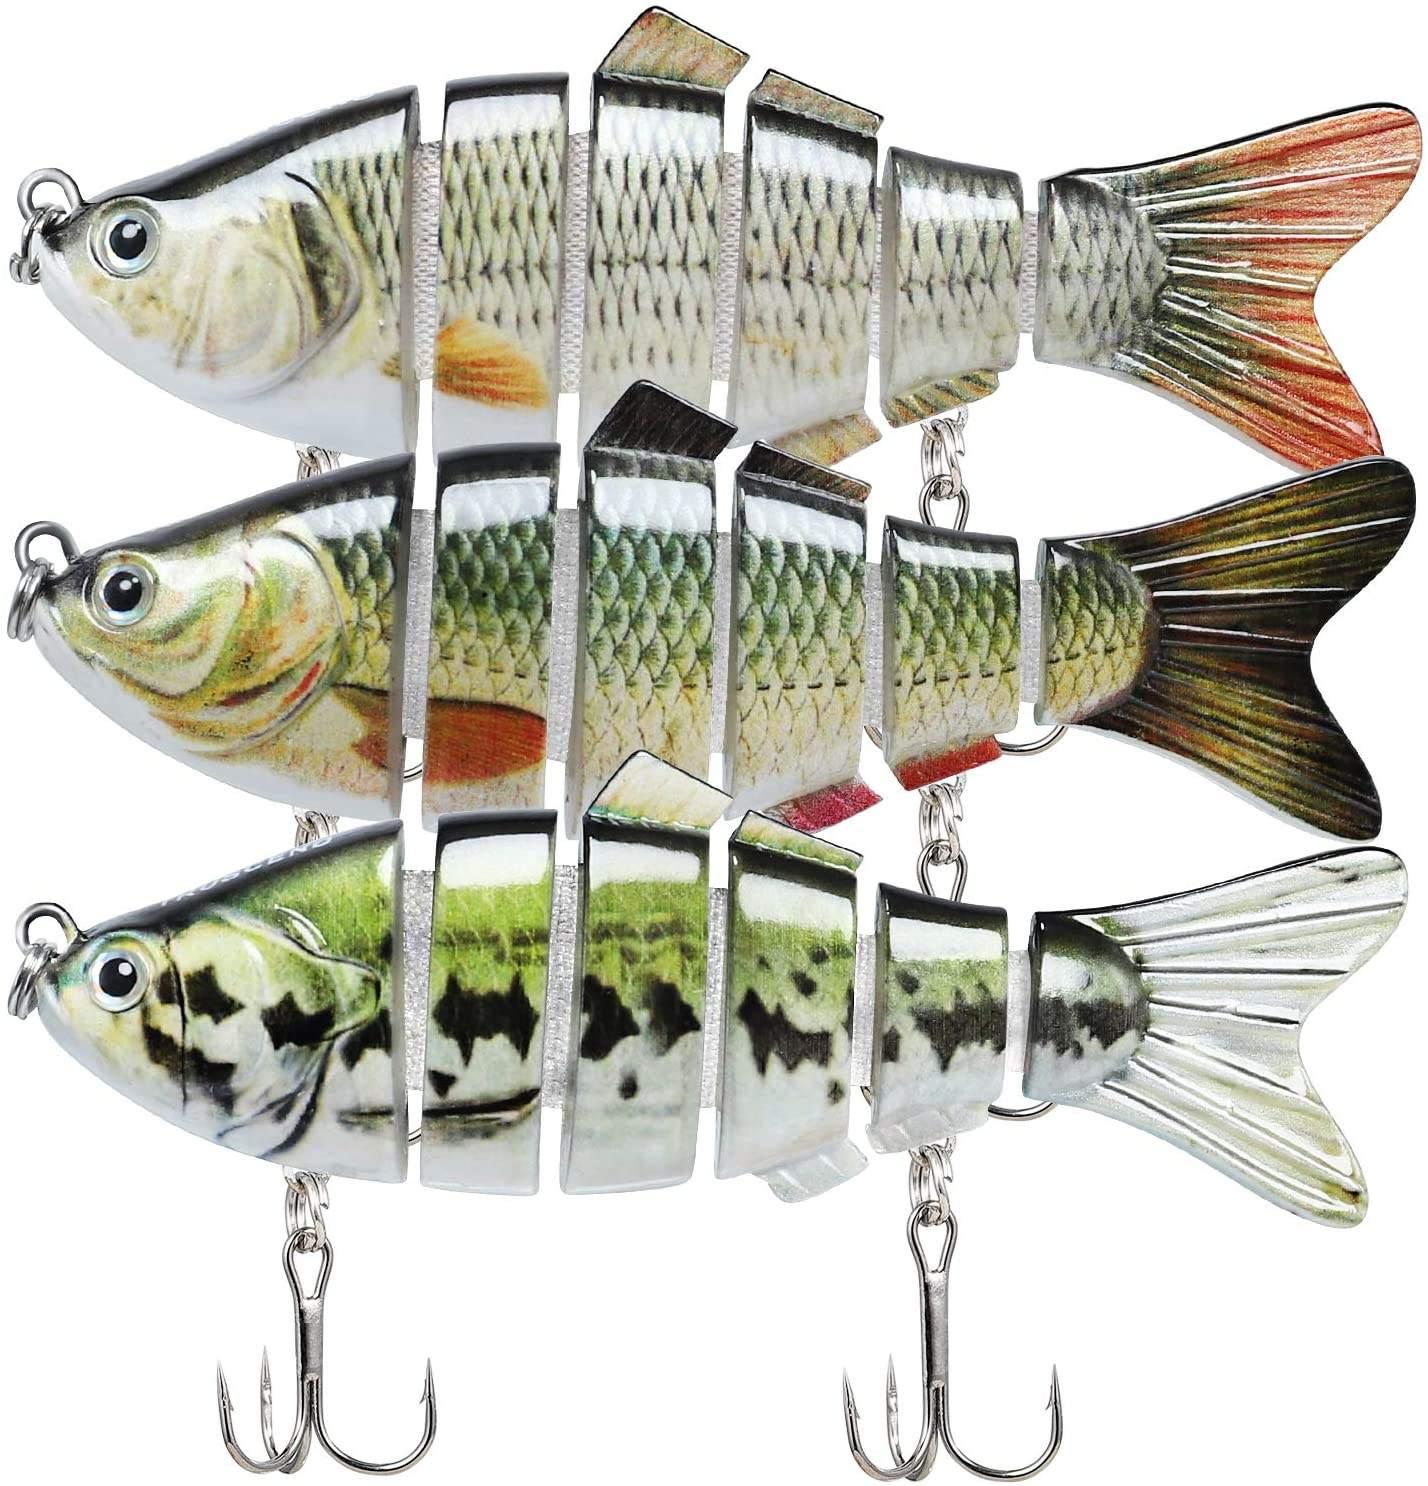 2pcs Fishing Lures Bionic Lures Metal Shaking Baits Trolling Wobblers Lures